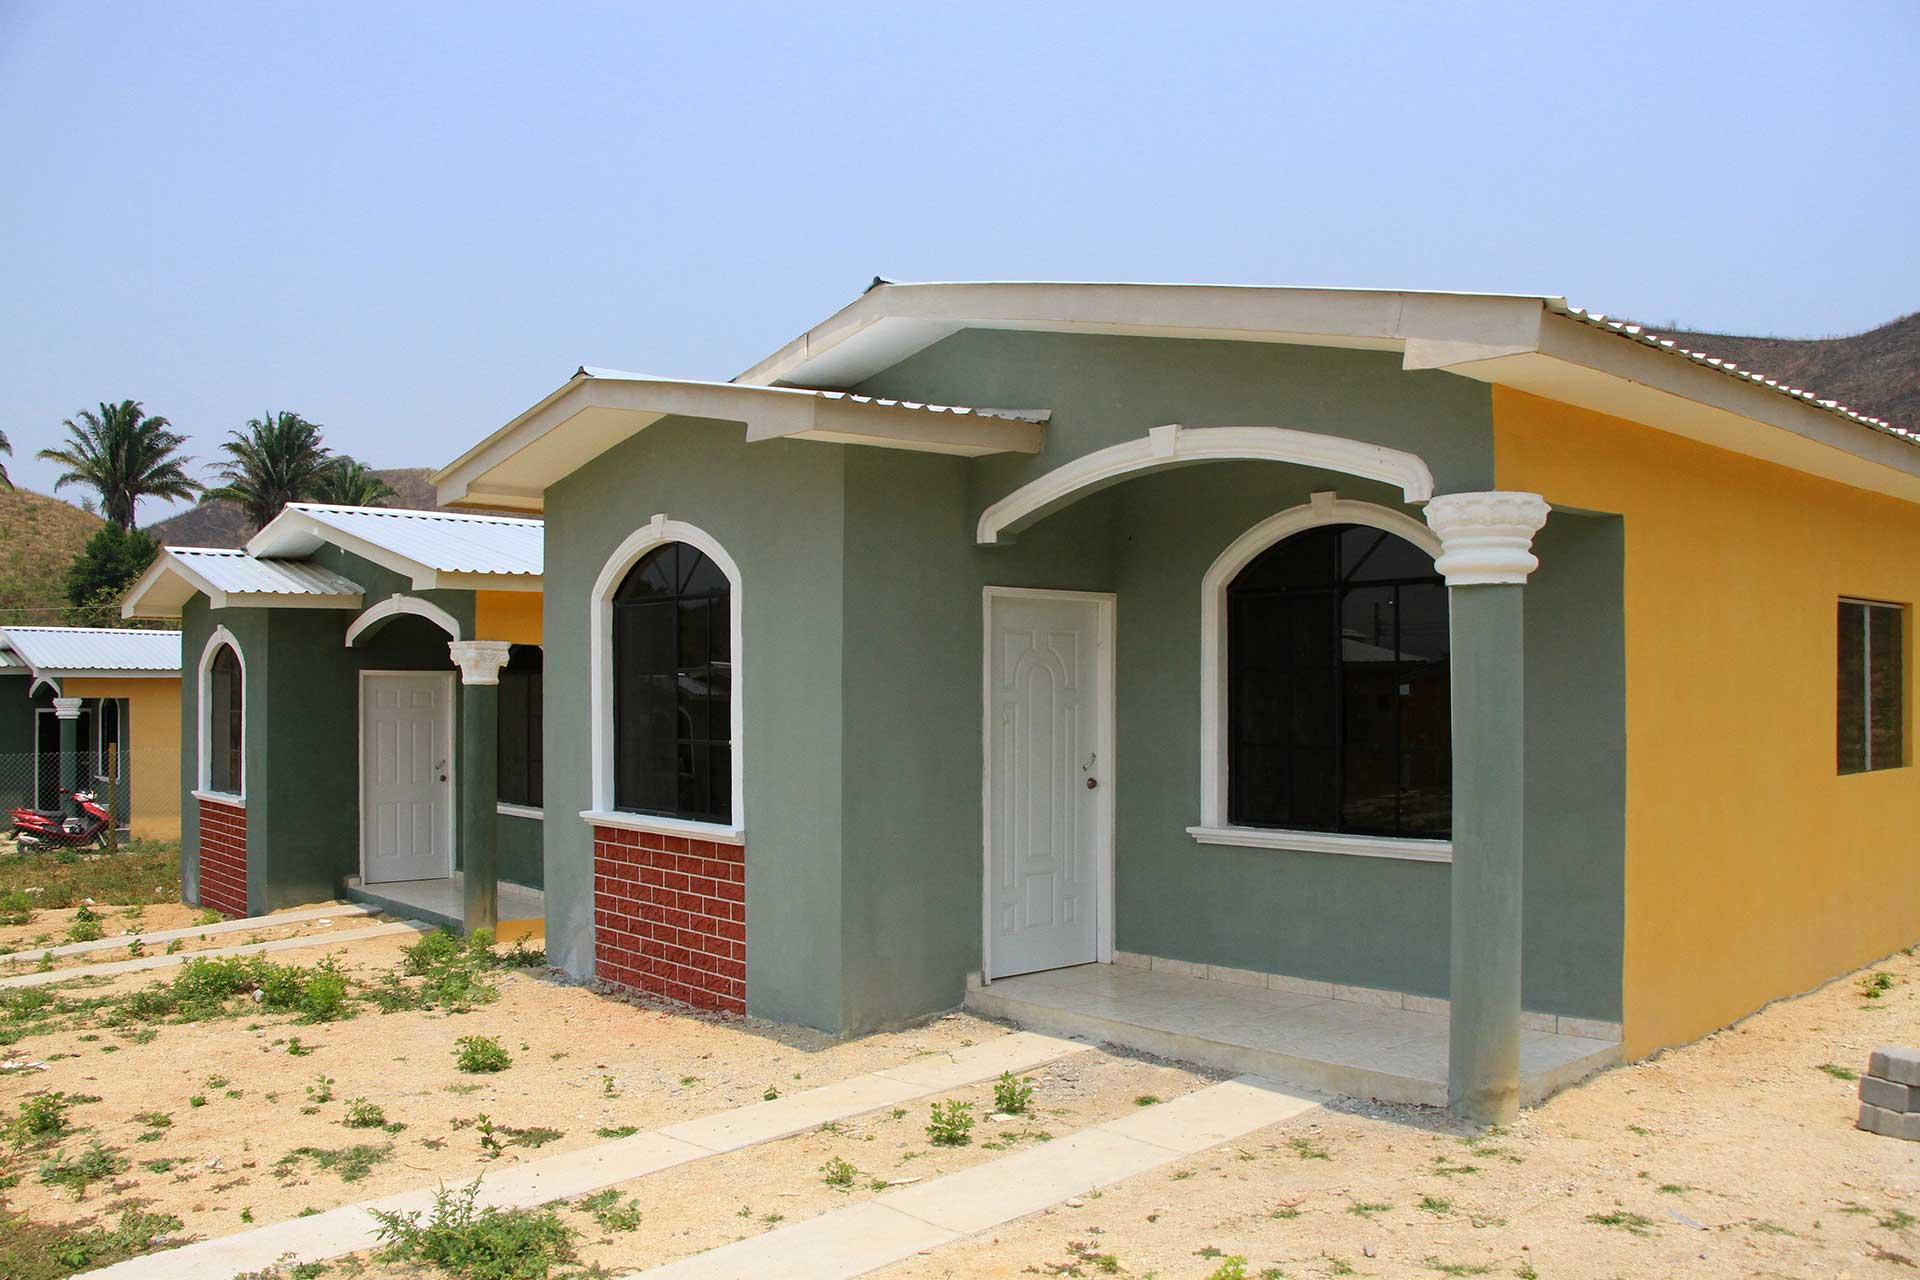 programa de vivienda social � asociaci243n hondure241a de